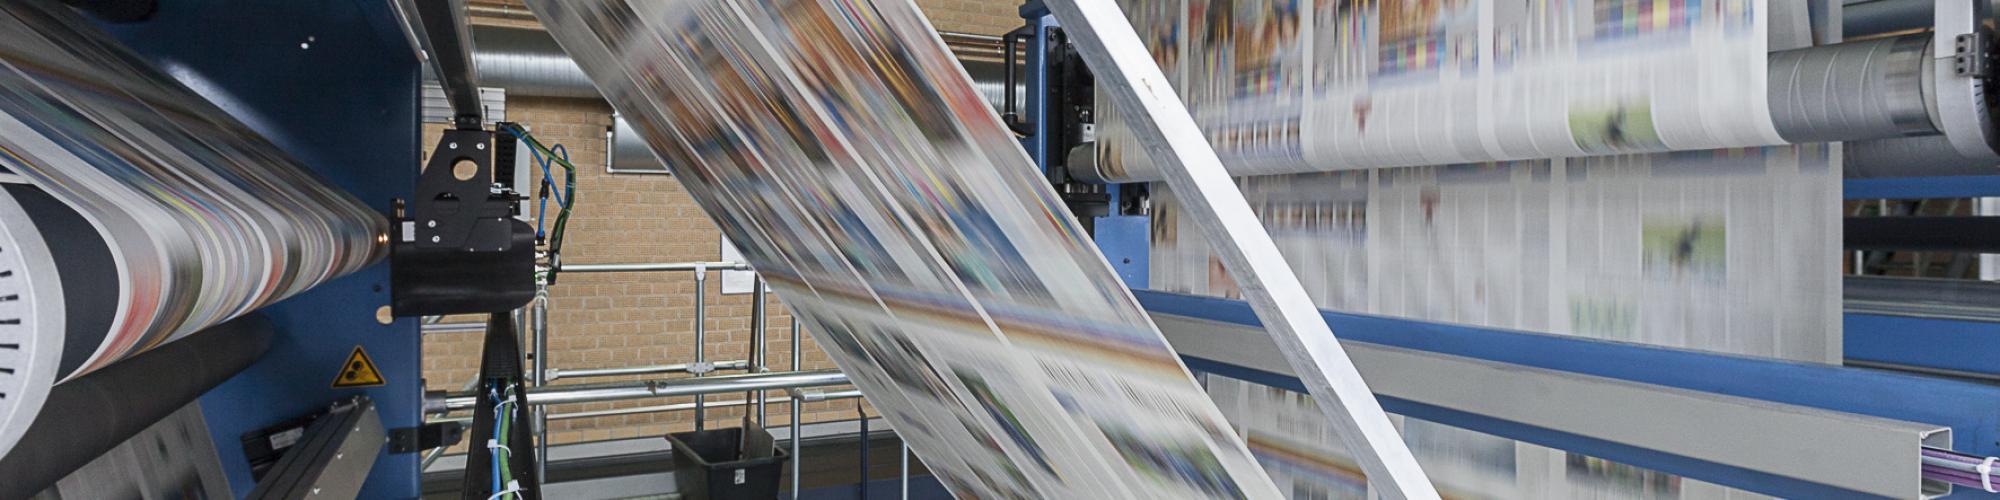 Pressedruck Potsdam GmbH